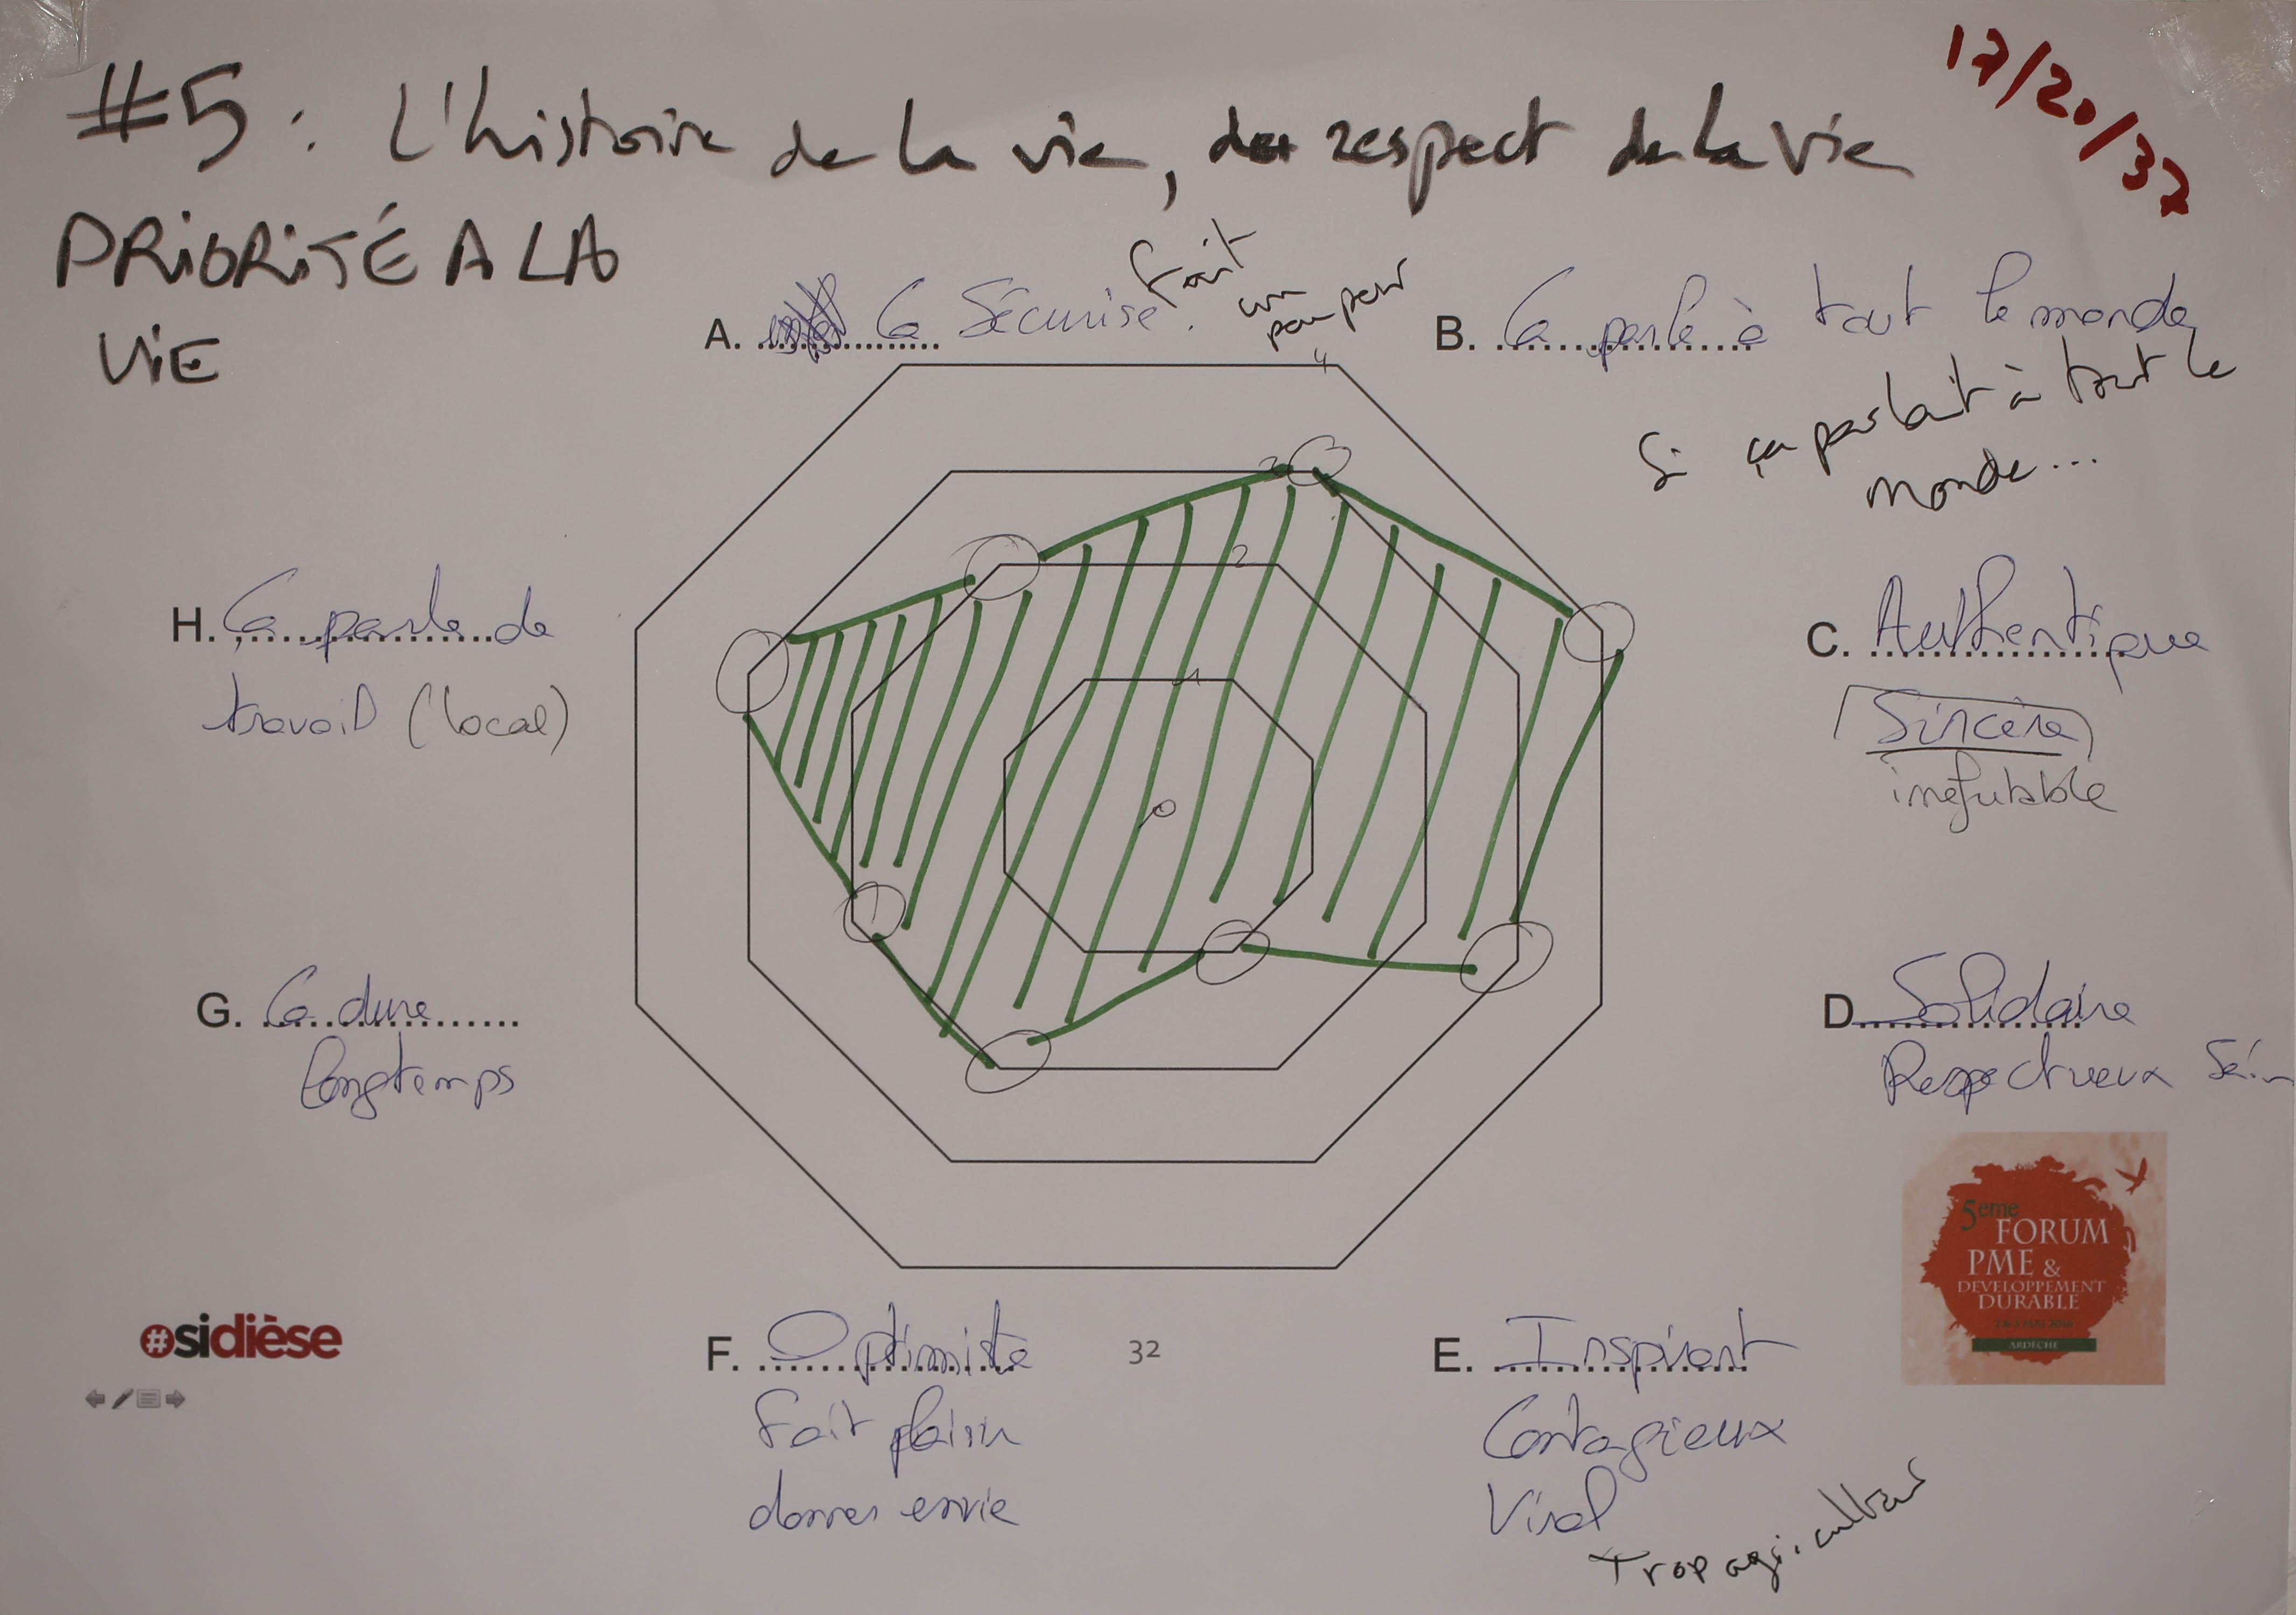 5 - Evaluation Priorite a la vie